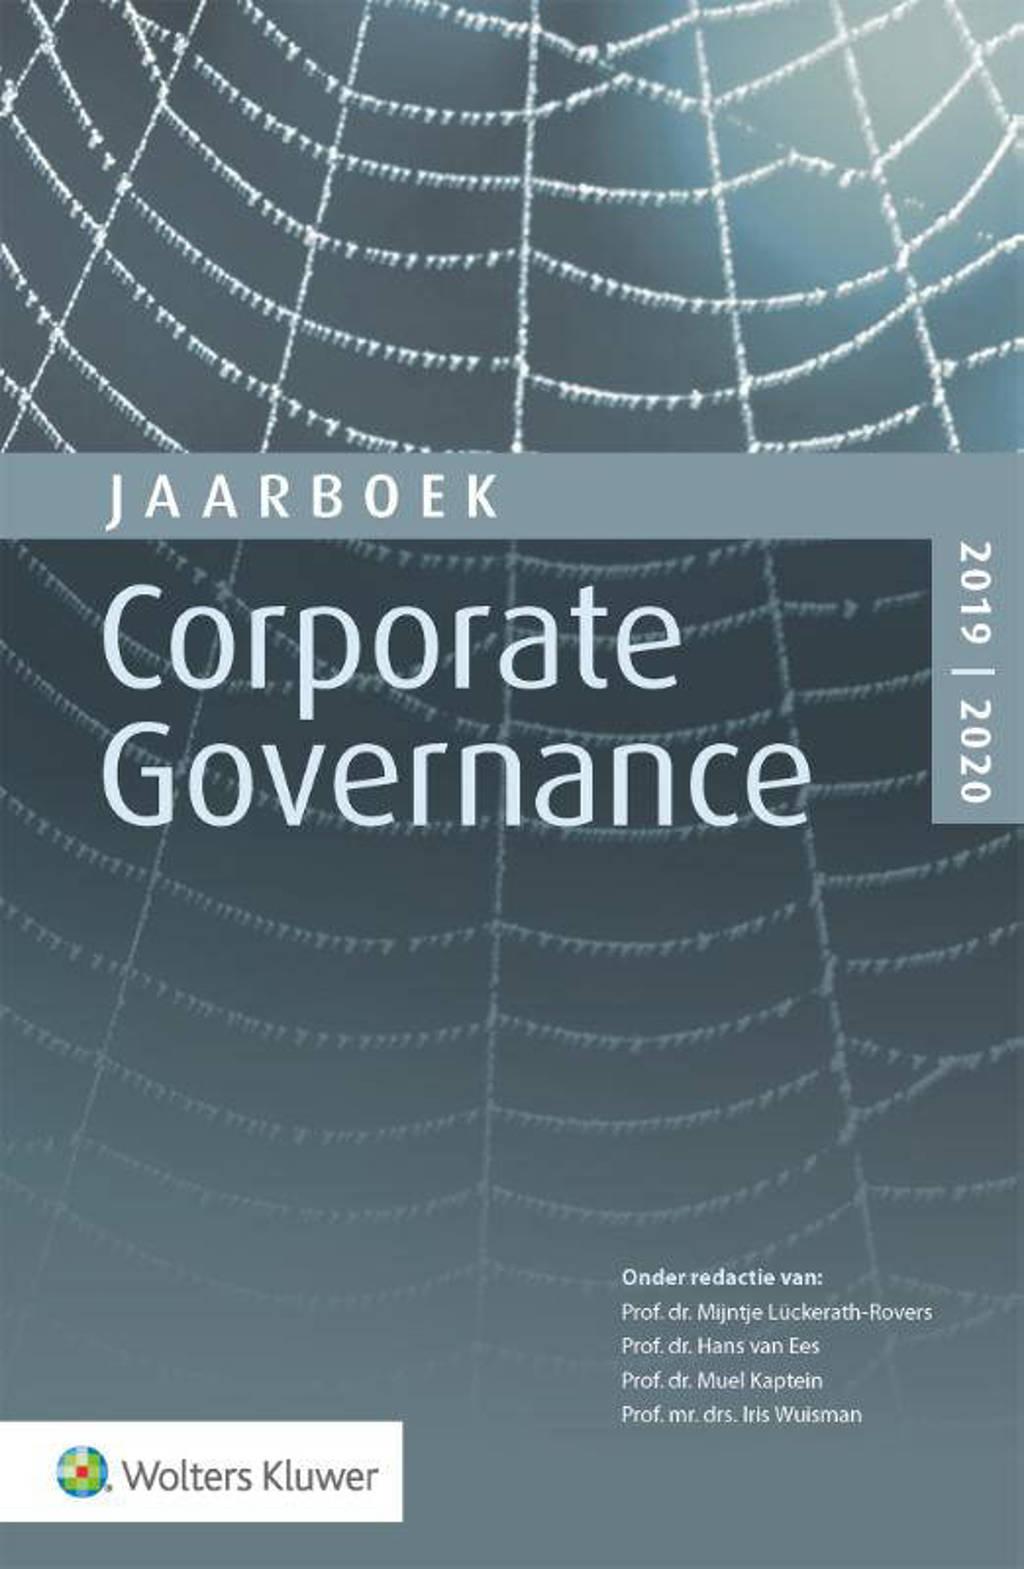 Jaarboek Corporate Governance 2019-2020